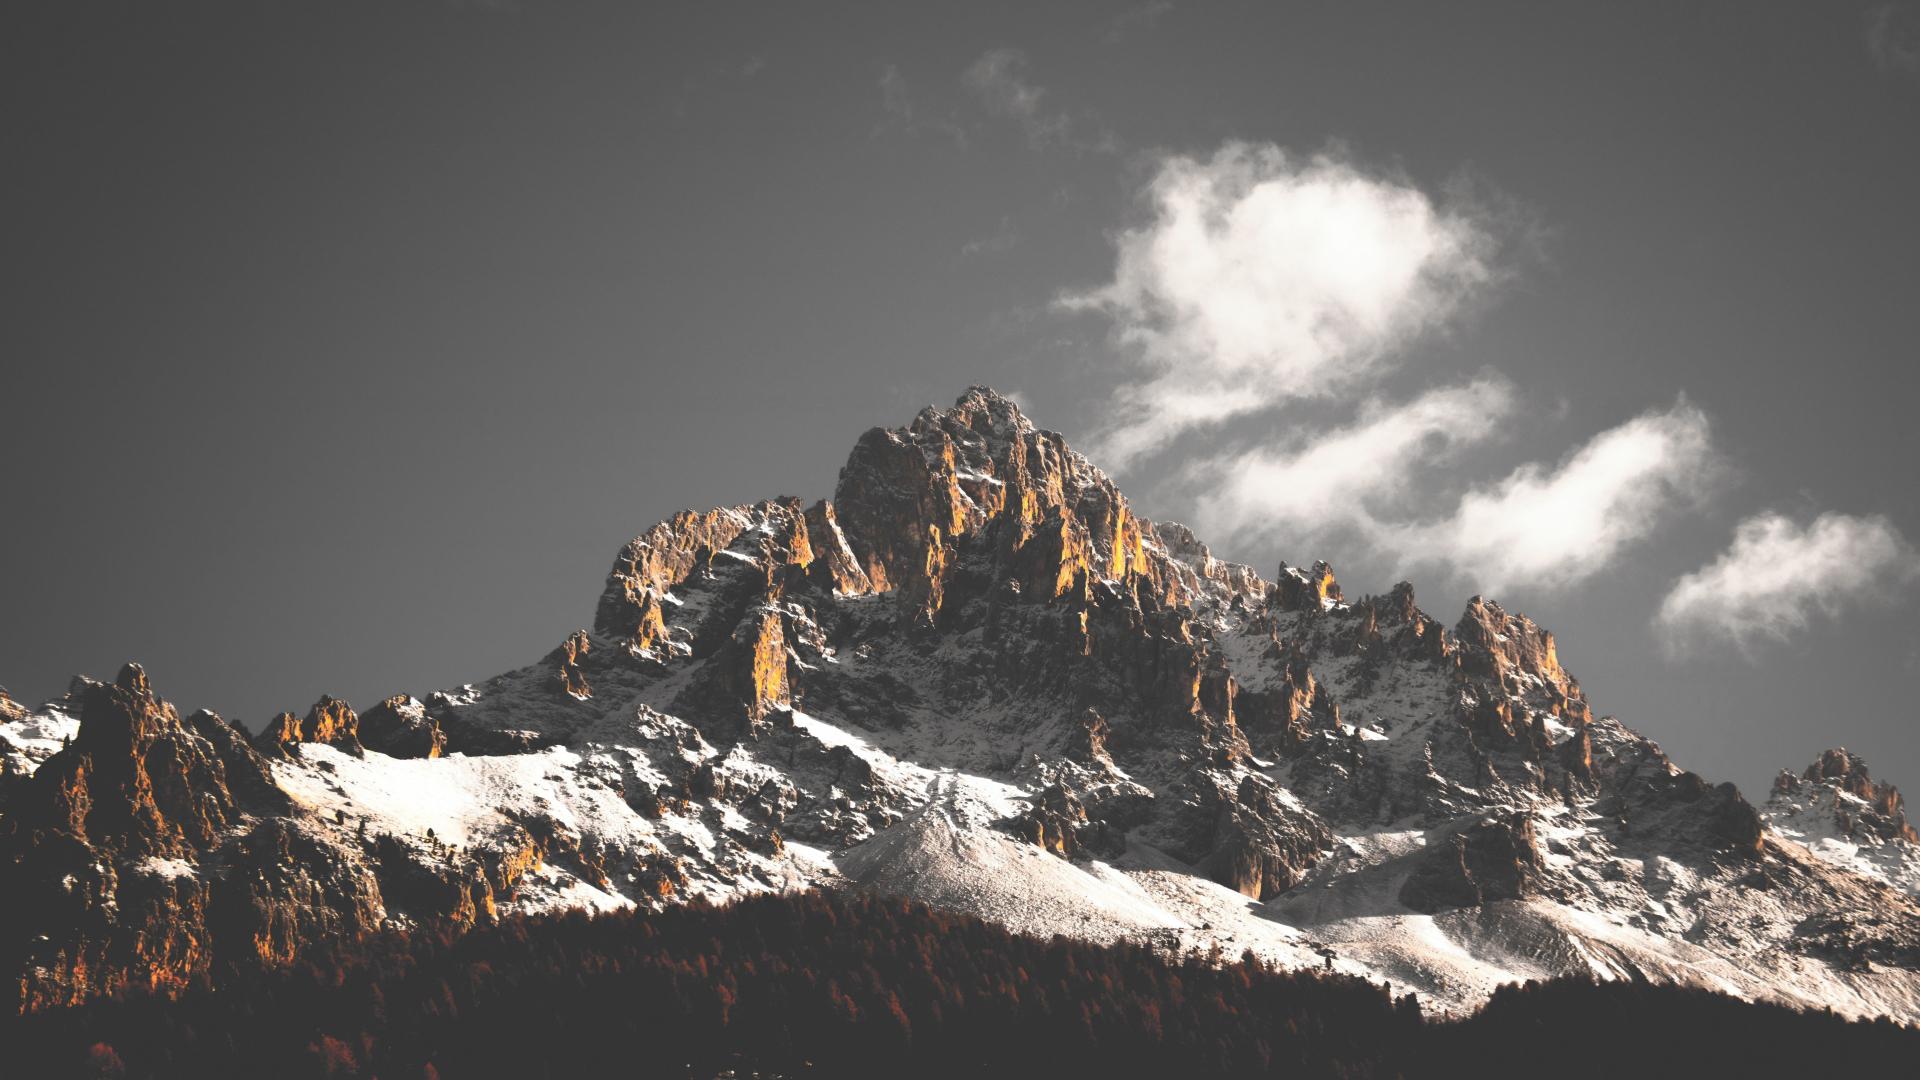 Mountain cliffs, nature, sky, clouds, tree, 1920x1080 wallpaper